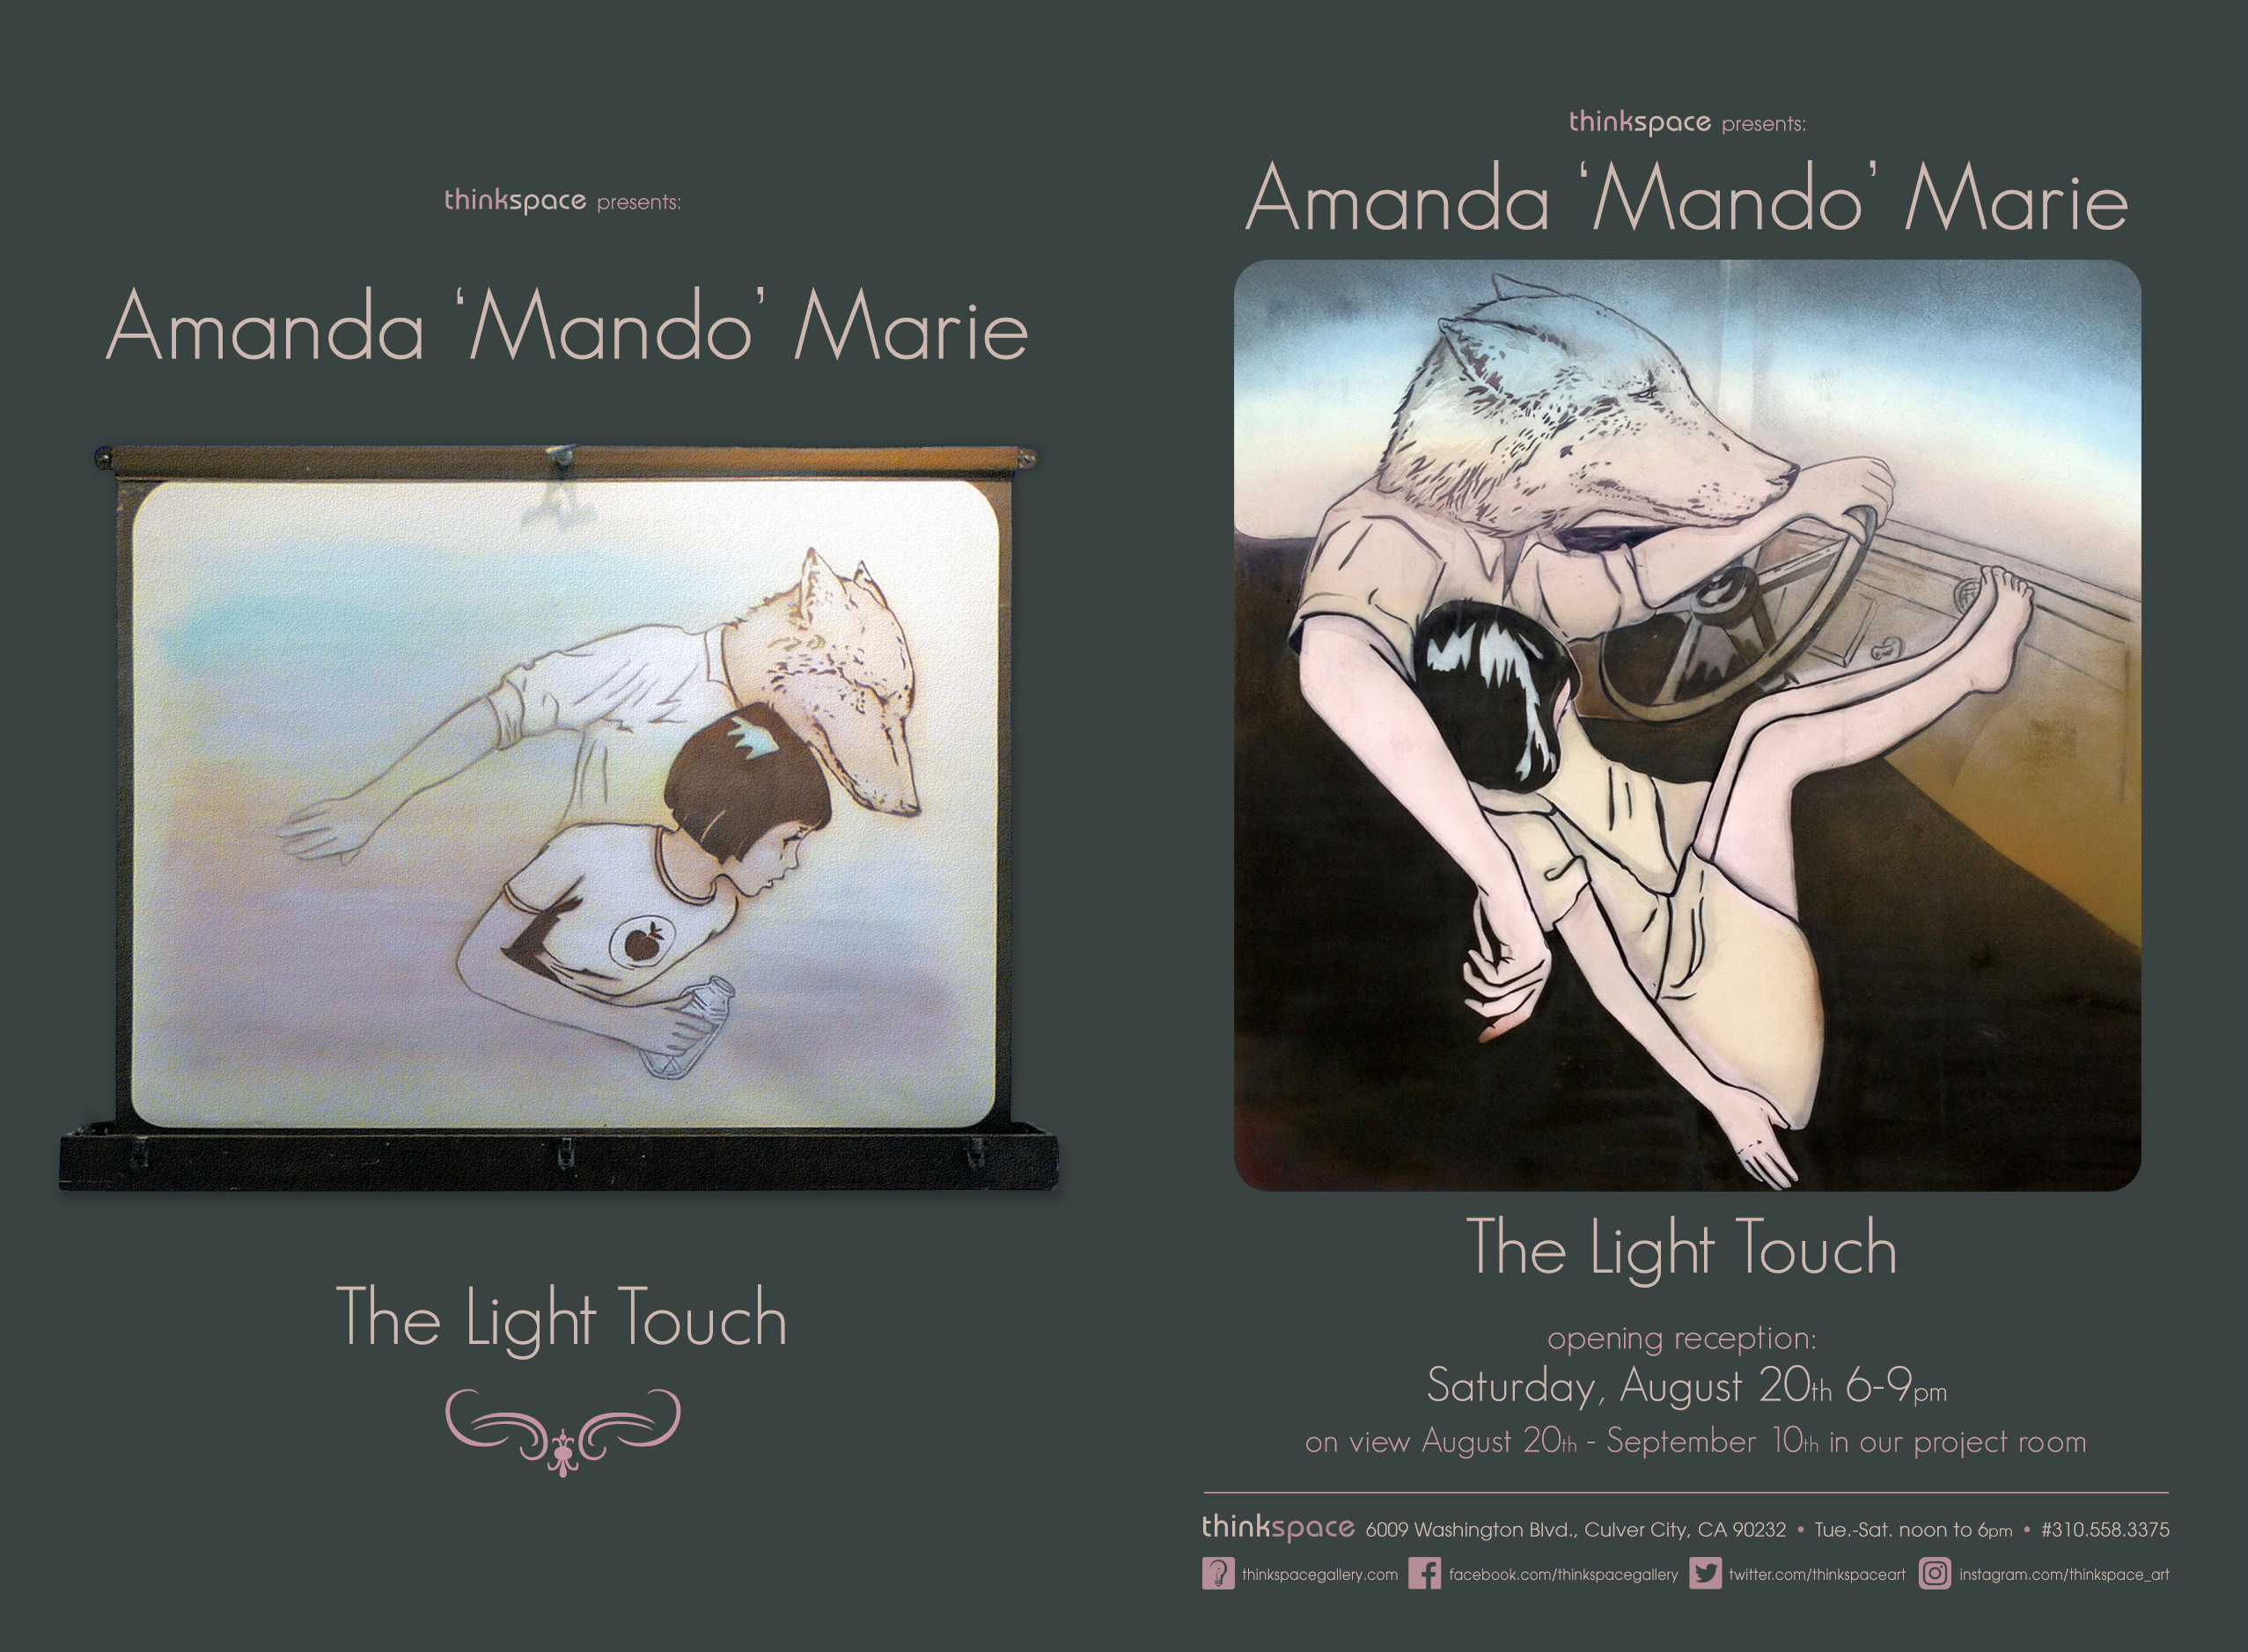 Amanda Mando Marie